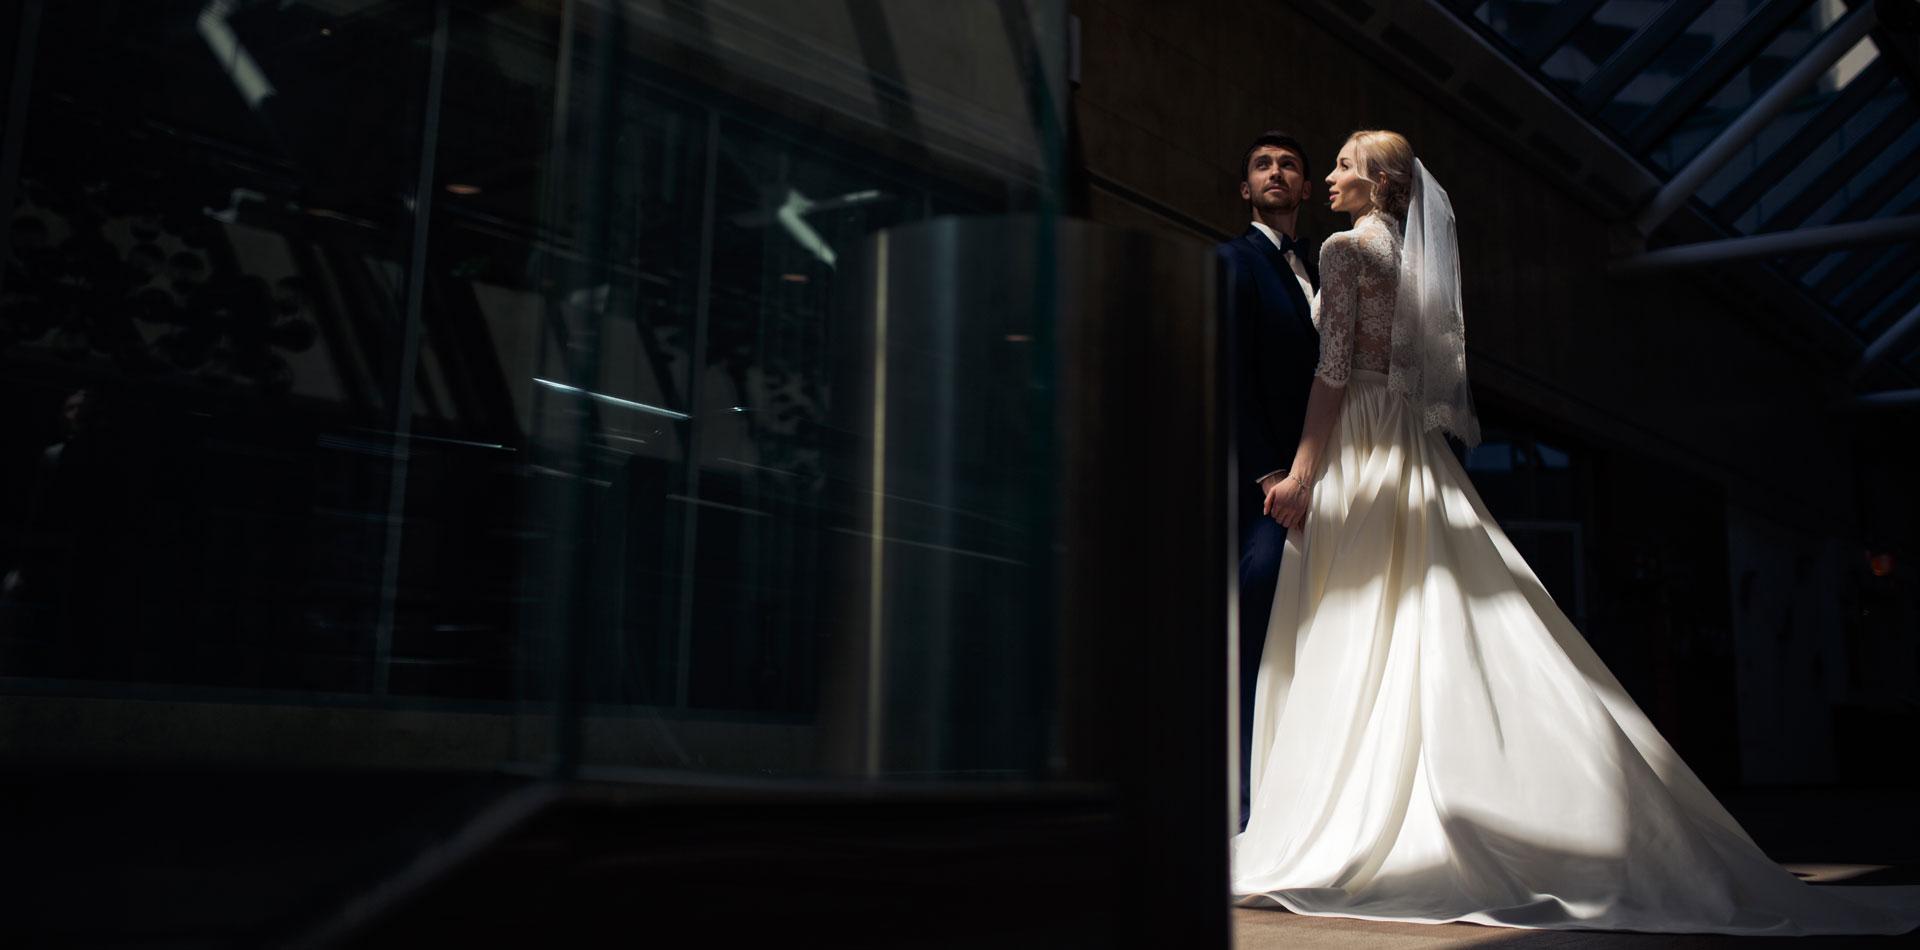 Вишневый сад. Свадьба Валентина Кротова и Натальи Ходуновой фото 2